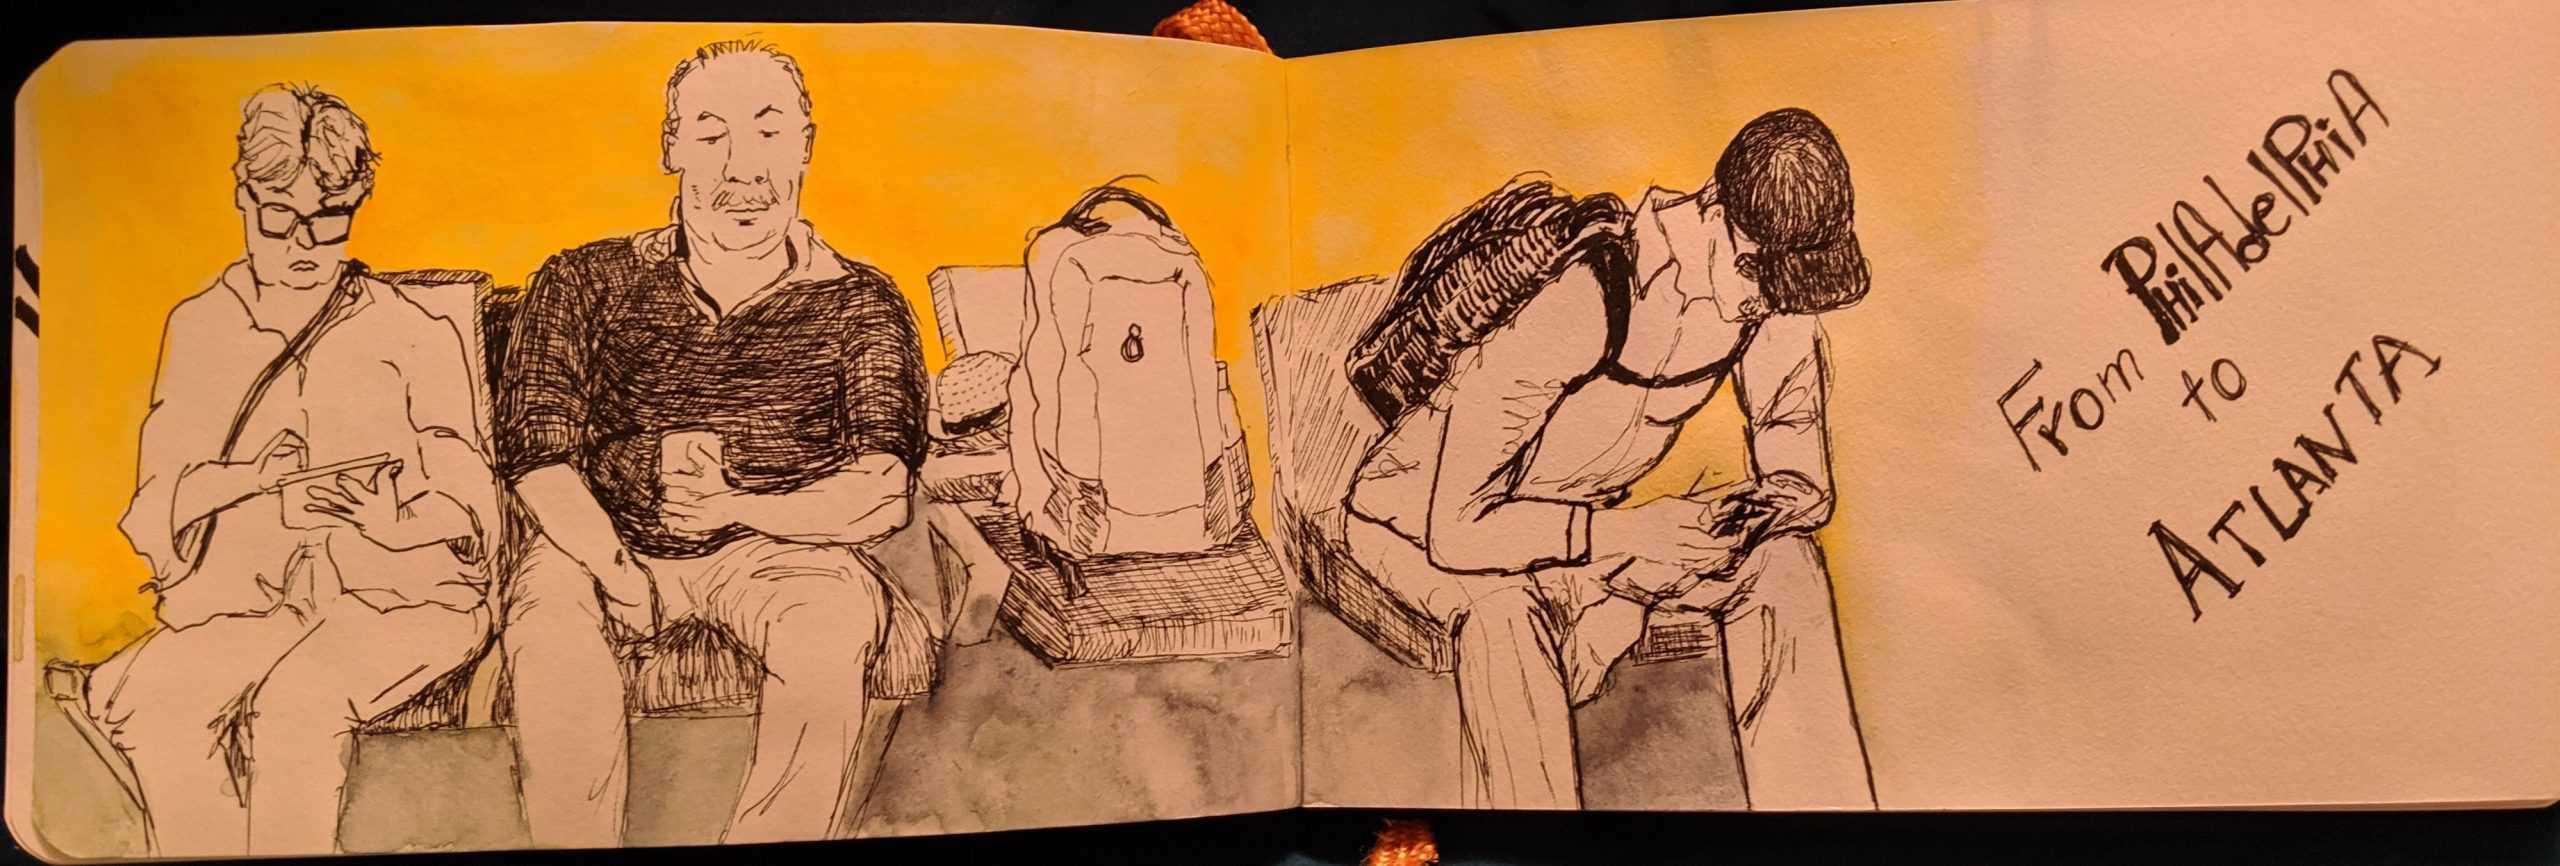 Irenka Dominguez-Pareto Drawing